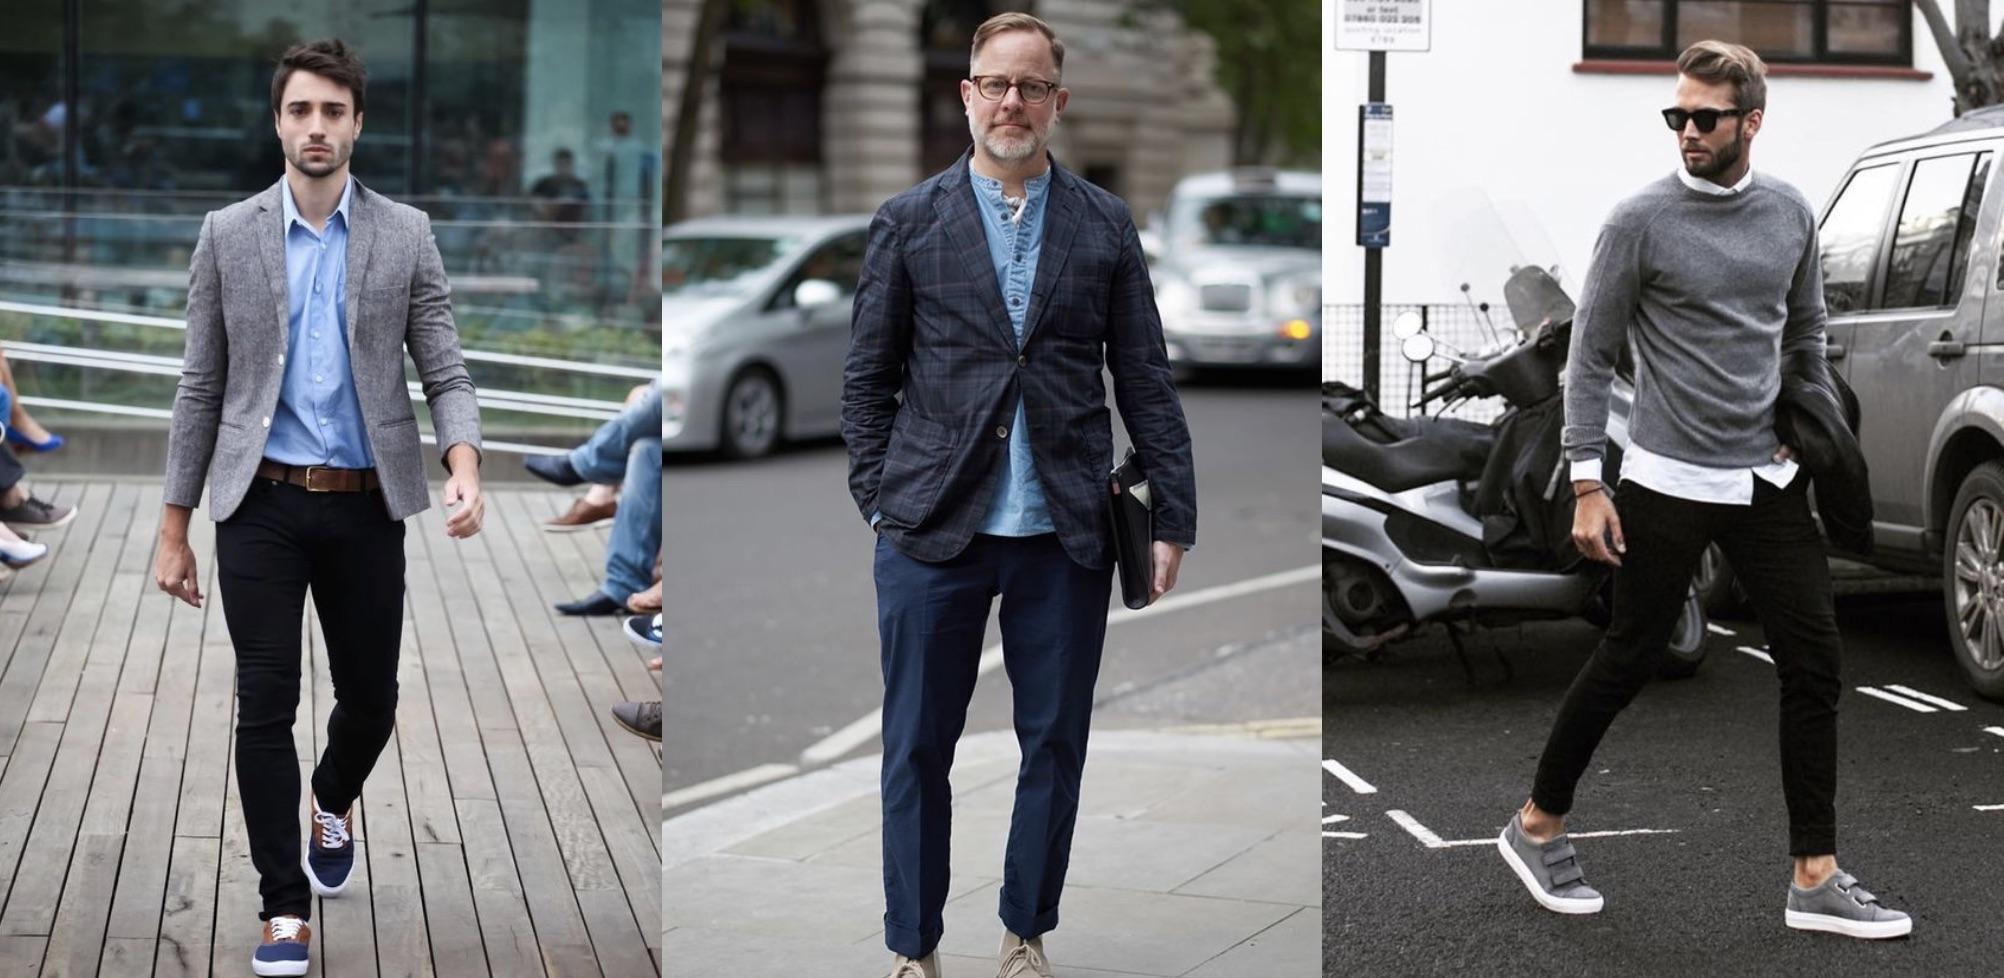 business casual kledingstijl